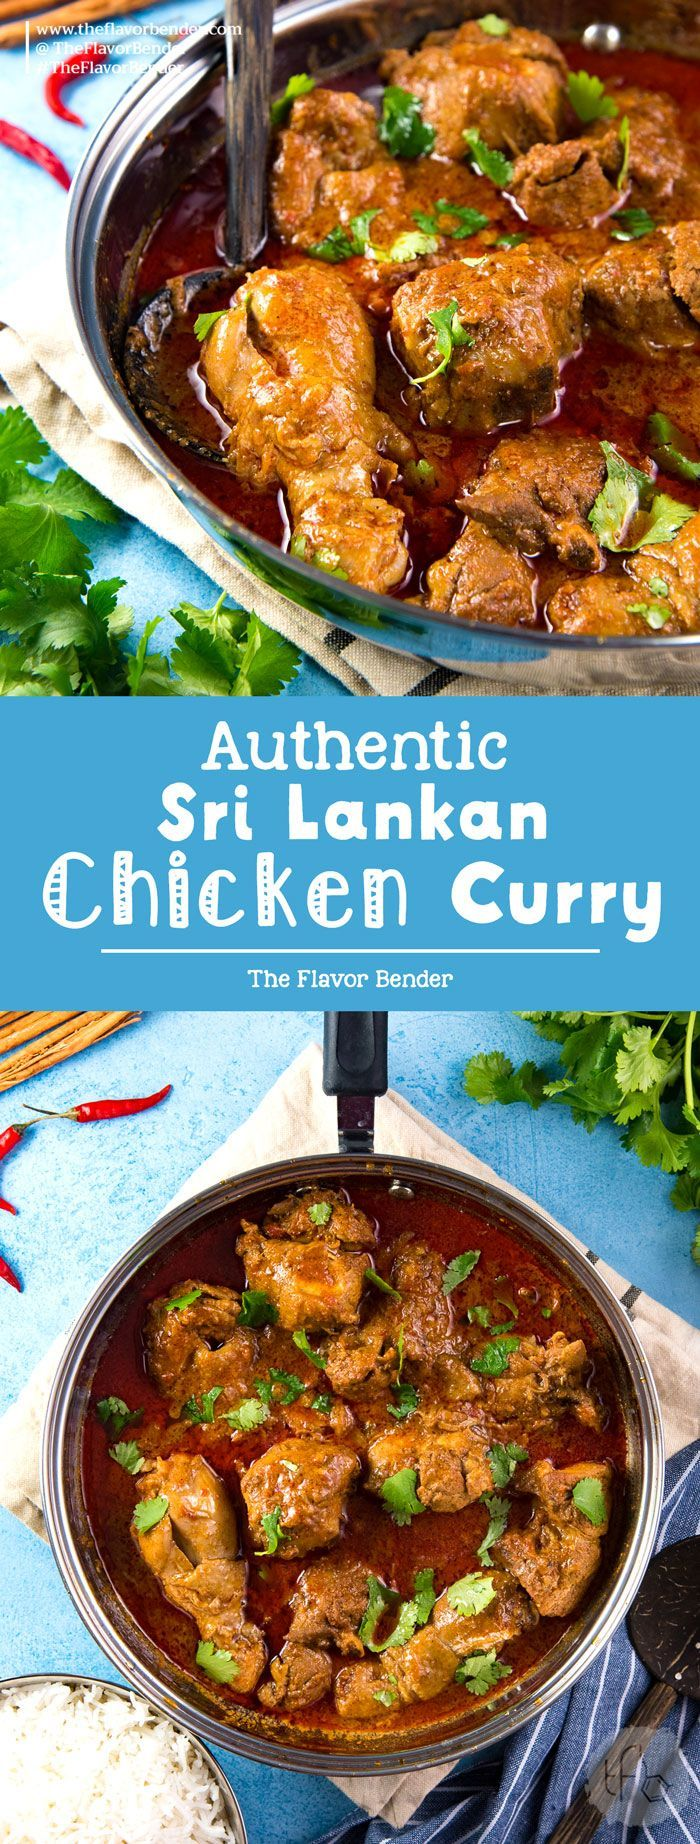 456 best International Recipes images on Pinterest   Amazing recipes ...